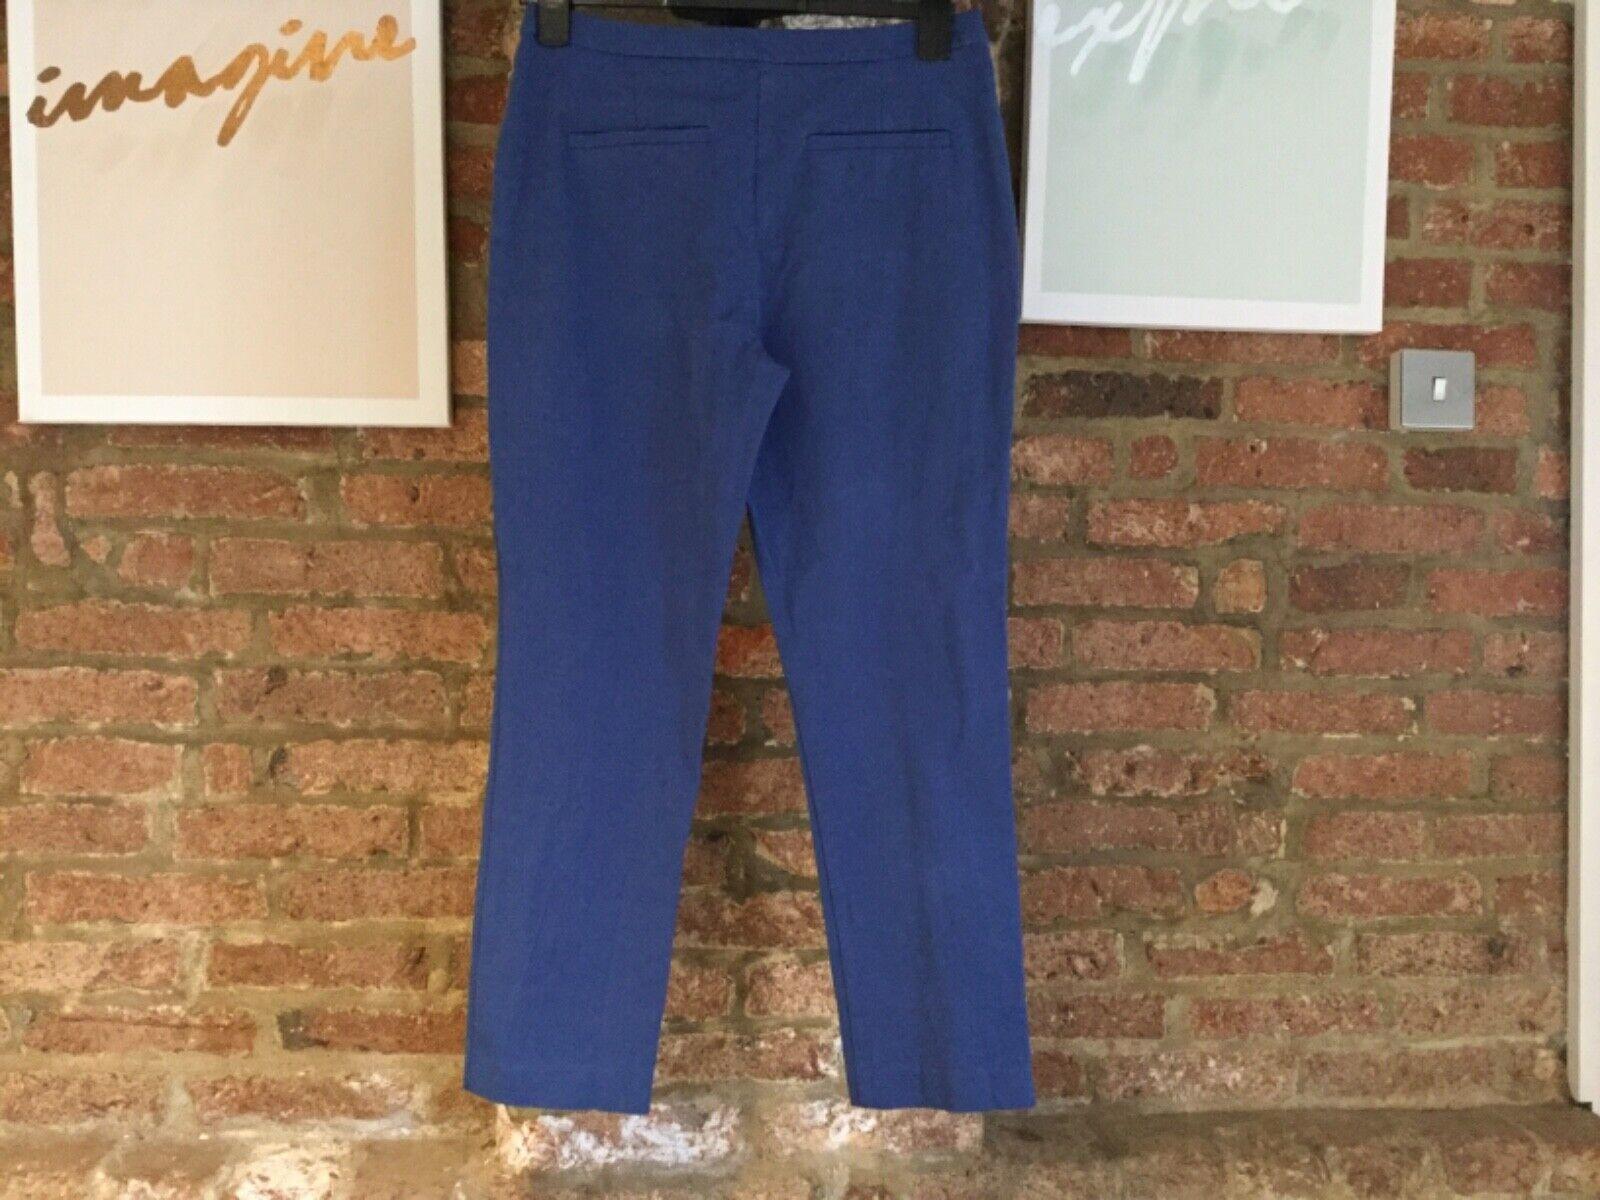 John John John Lewis & Partners Dionne Trousers in Blau UK10 56cdf3